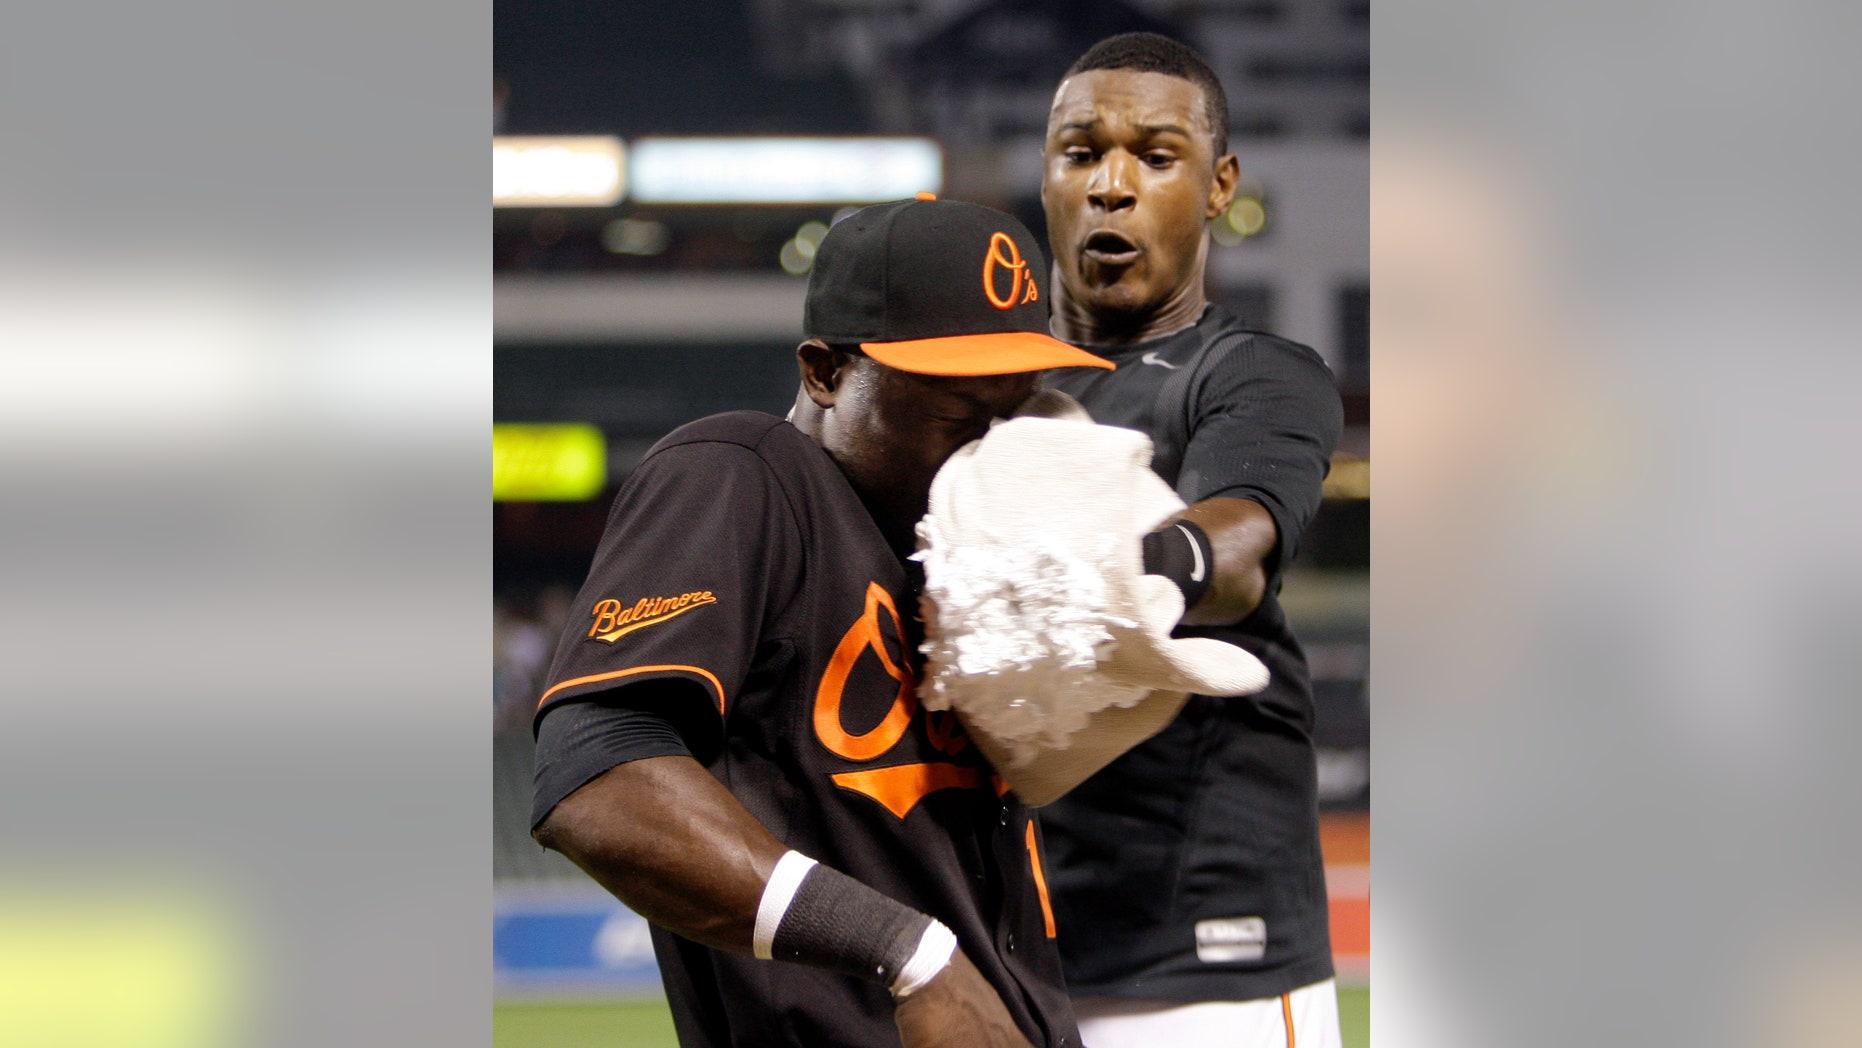 Felix Pie, left, is hit in the face with a shaving cream pie by Orioles teammate Adam Jones.